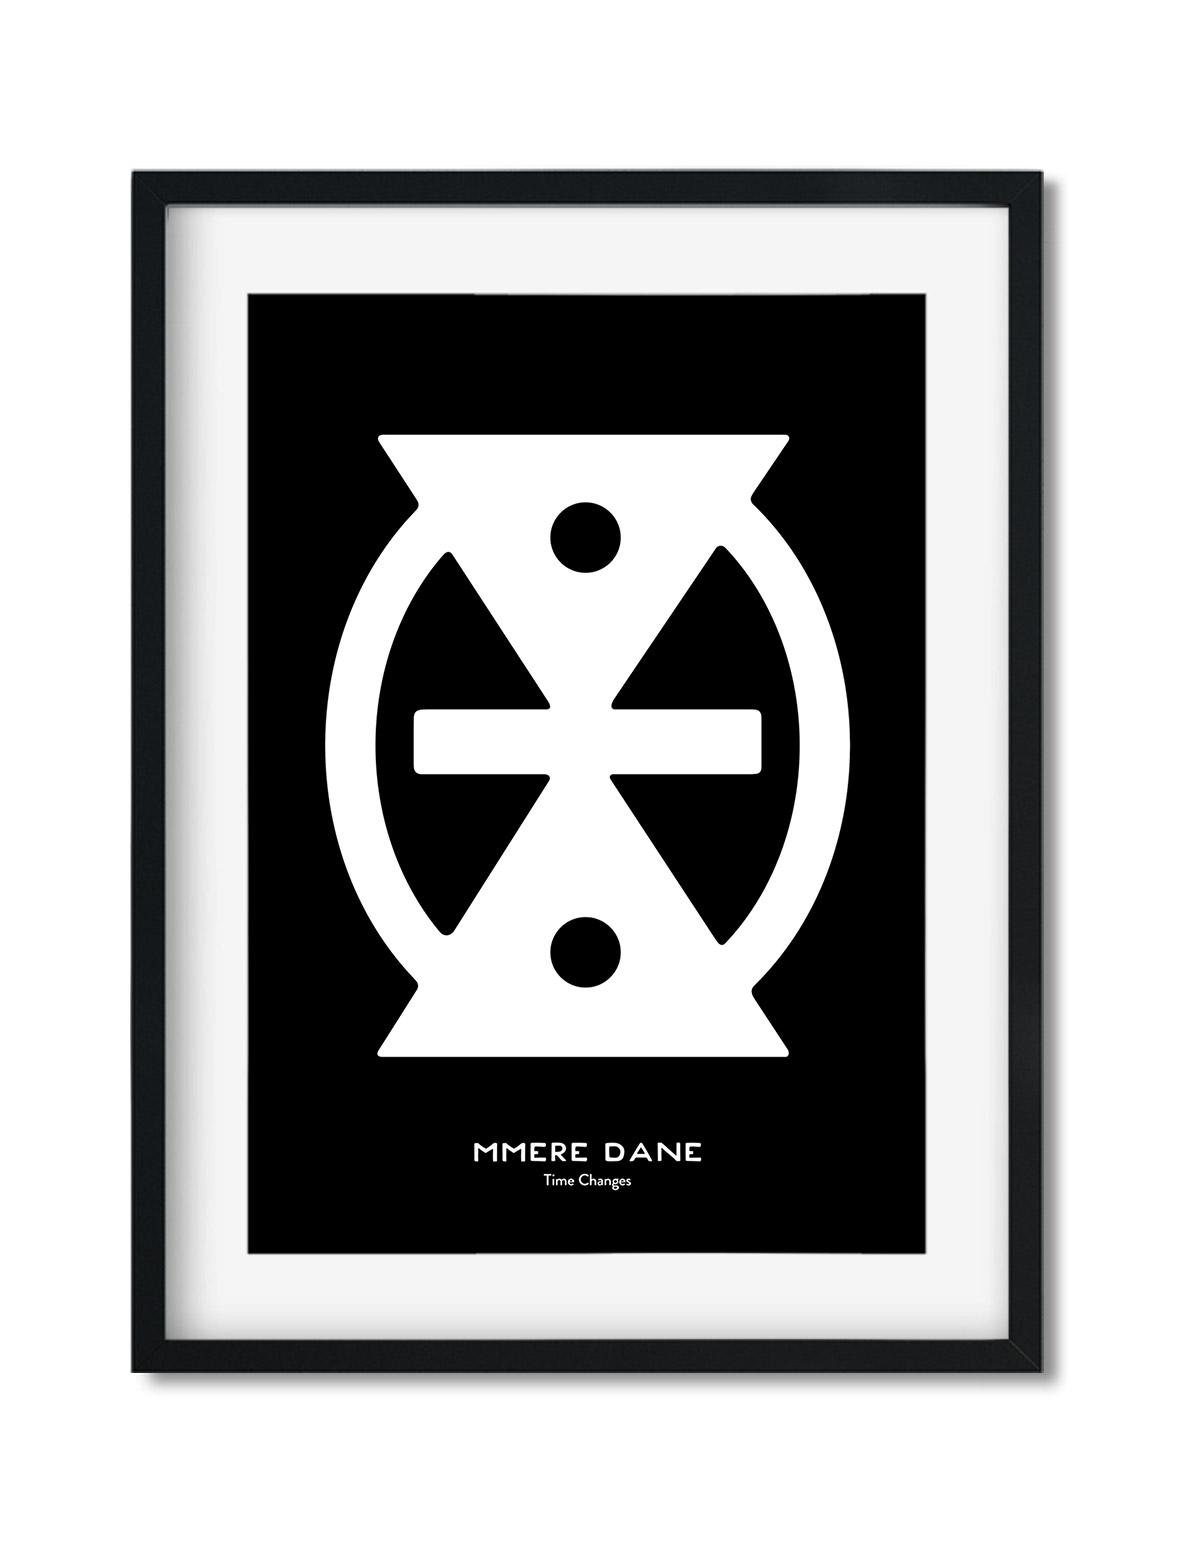 Mmere Dane, Adinkra Symbol, African Art Print Black